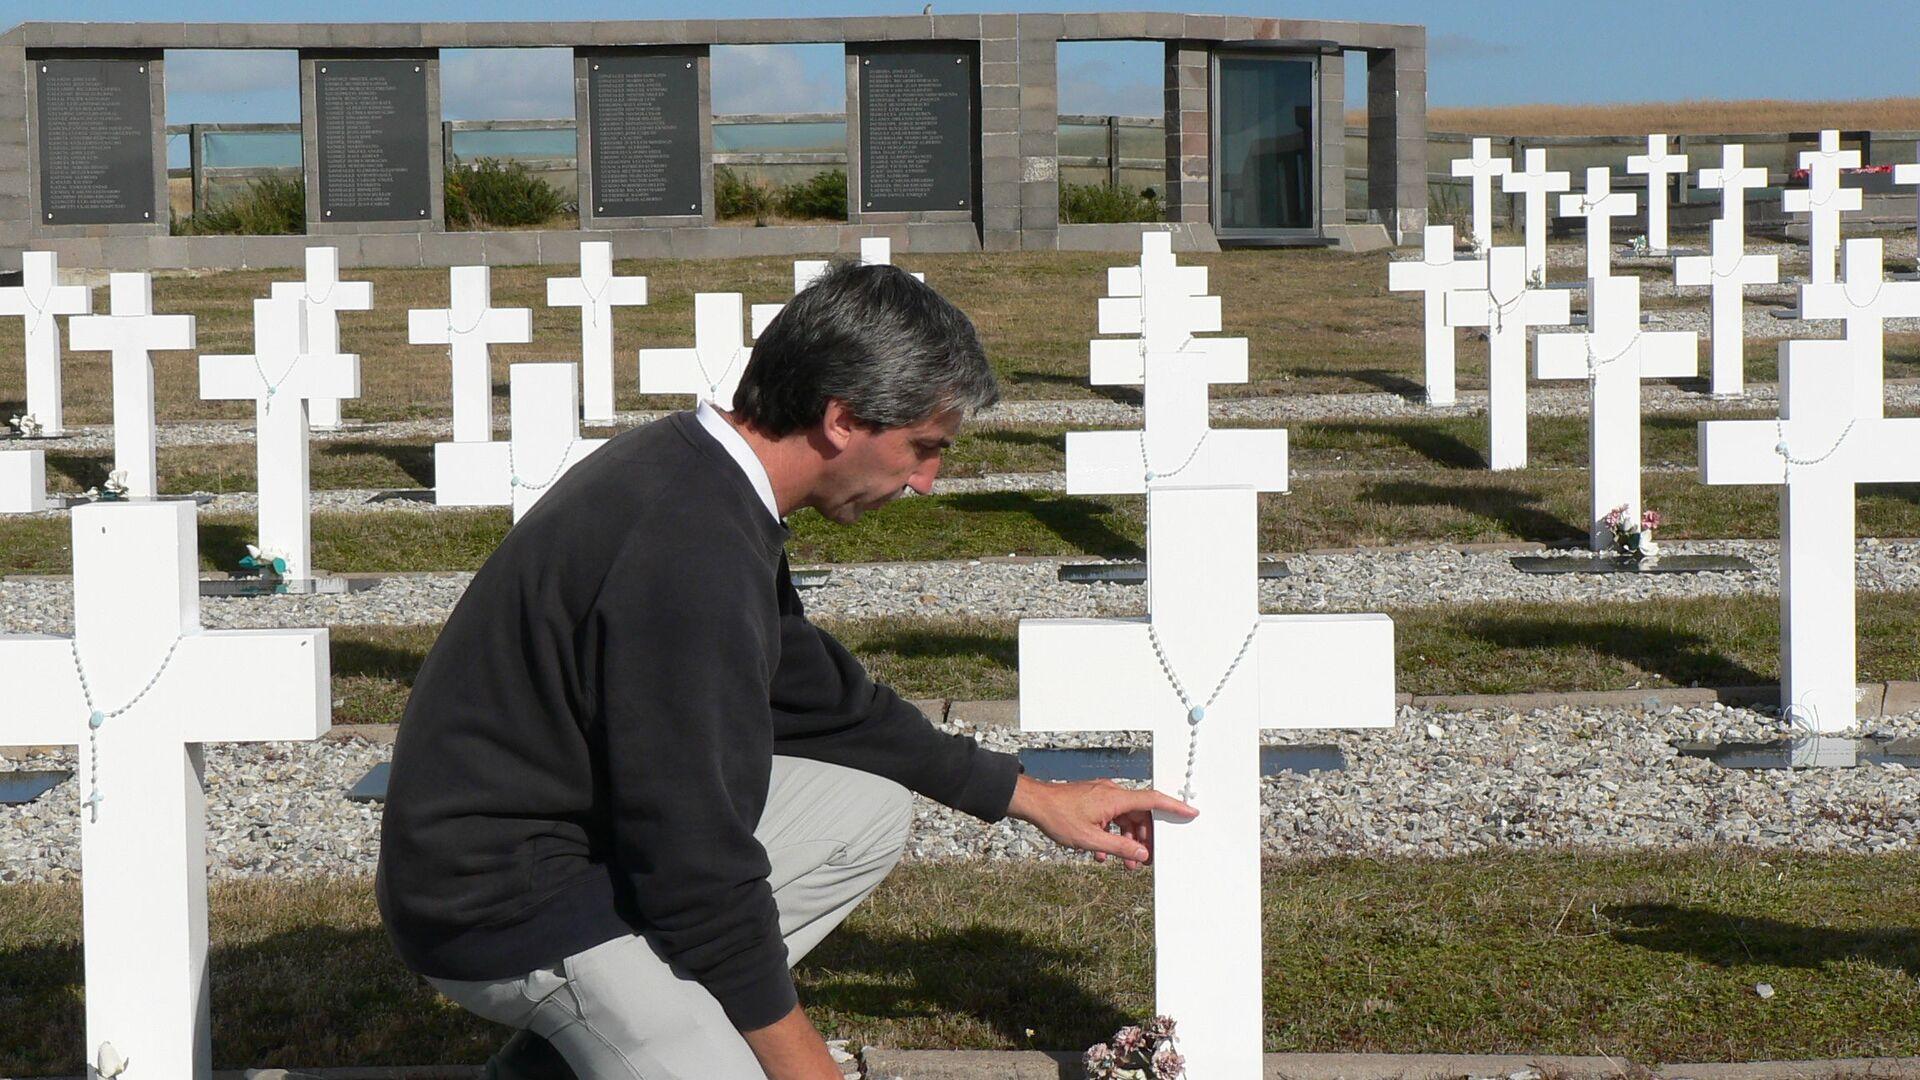 Julio Aro en el Cementerio de Darwin, Islas Malvinas - Sputnik Mundo, 1920, 16.02.2021